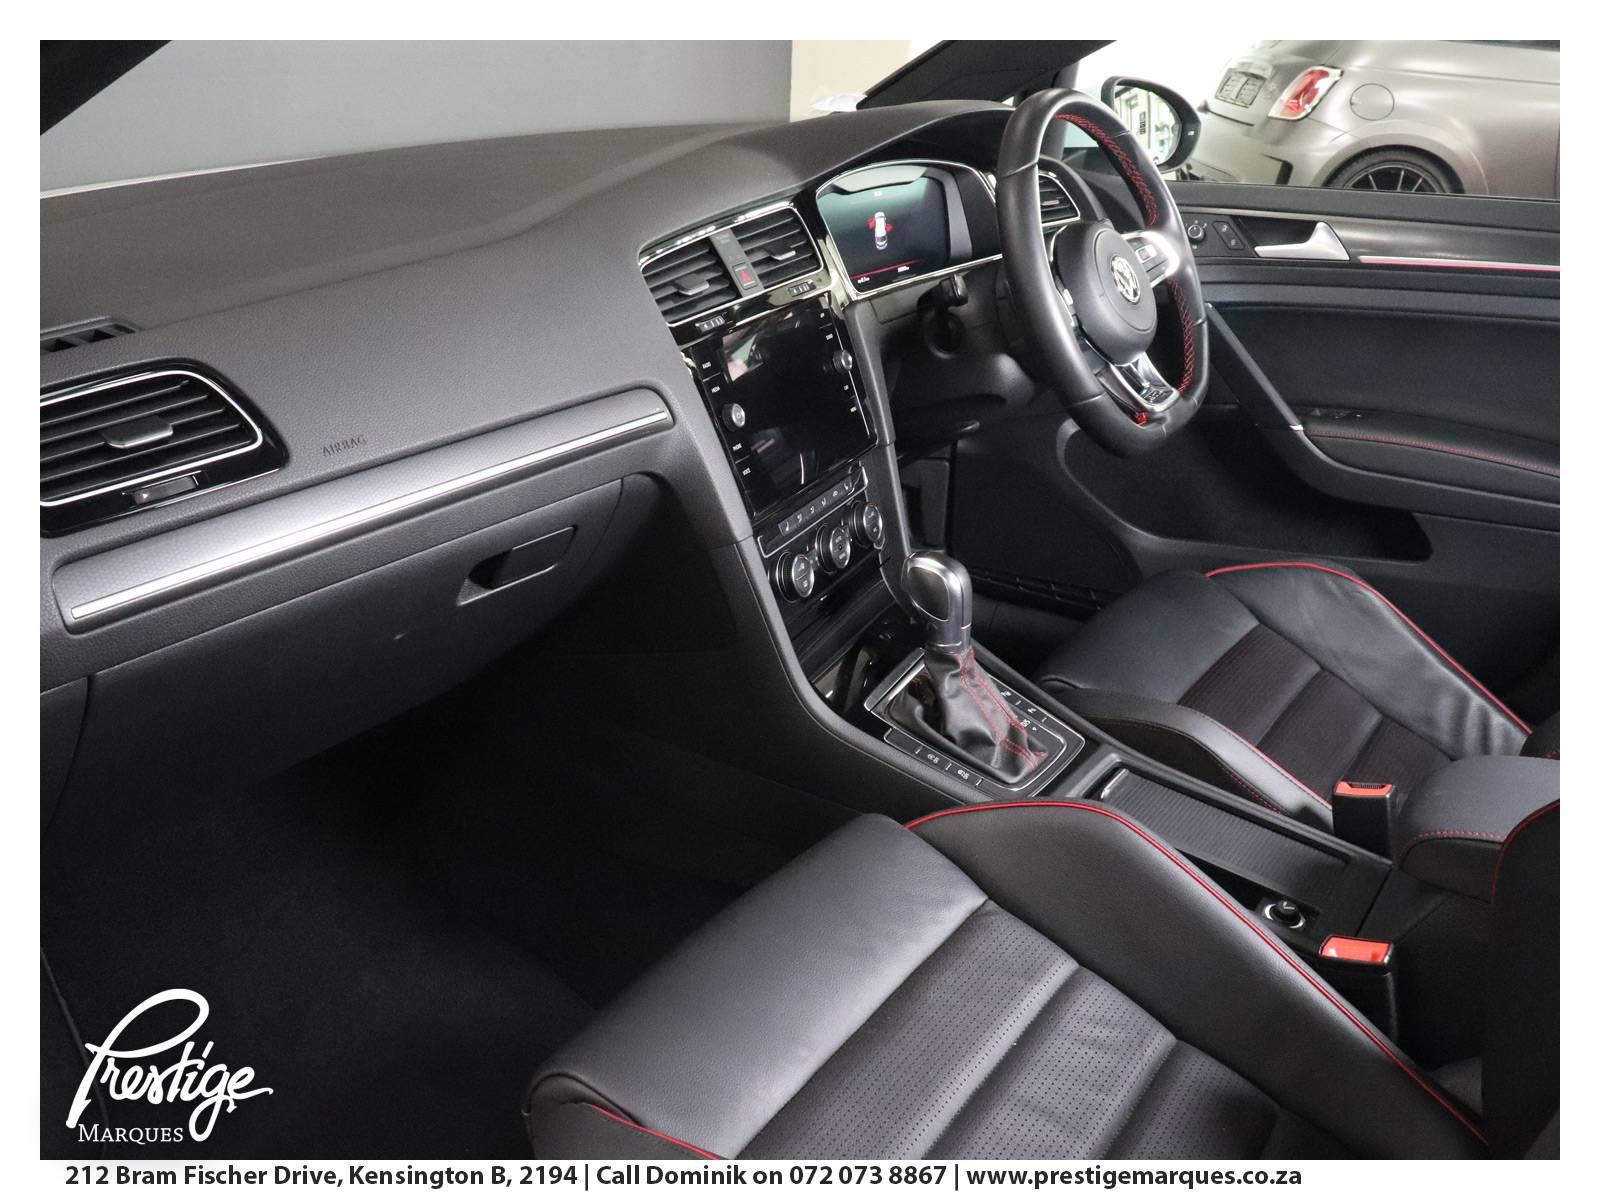 2017-Volkswagen-Golf-GTI-DSG-Facelift-Prestige-Marques-Randburg-Sandton-11